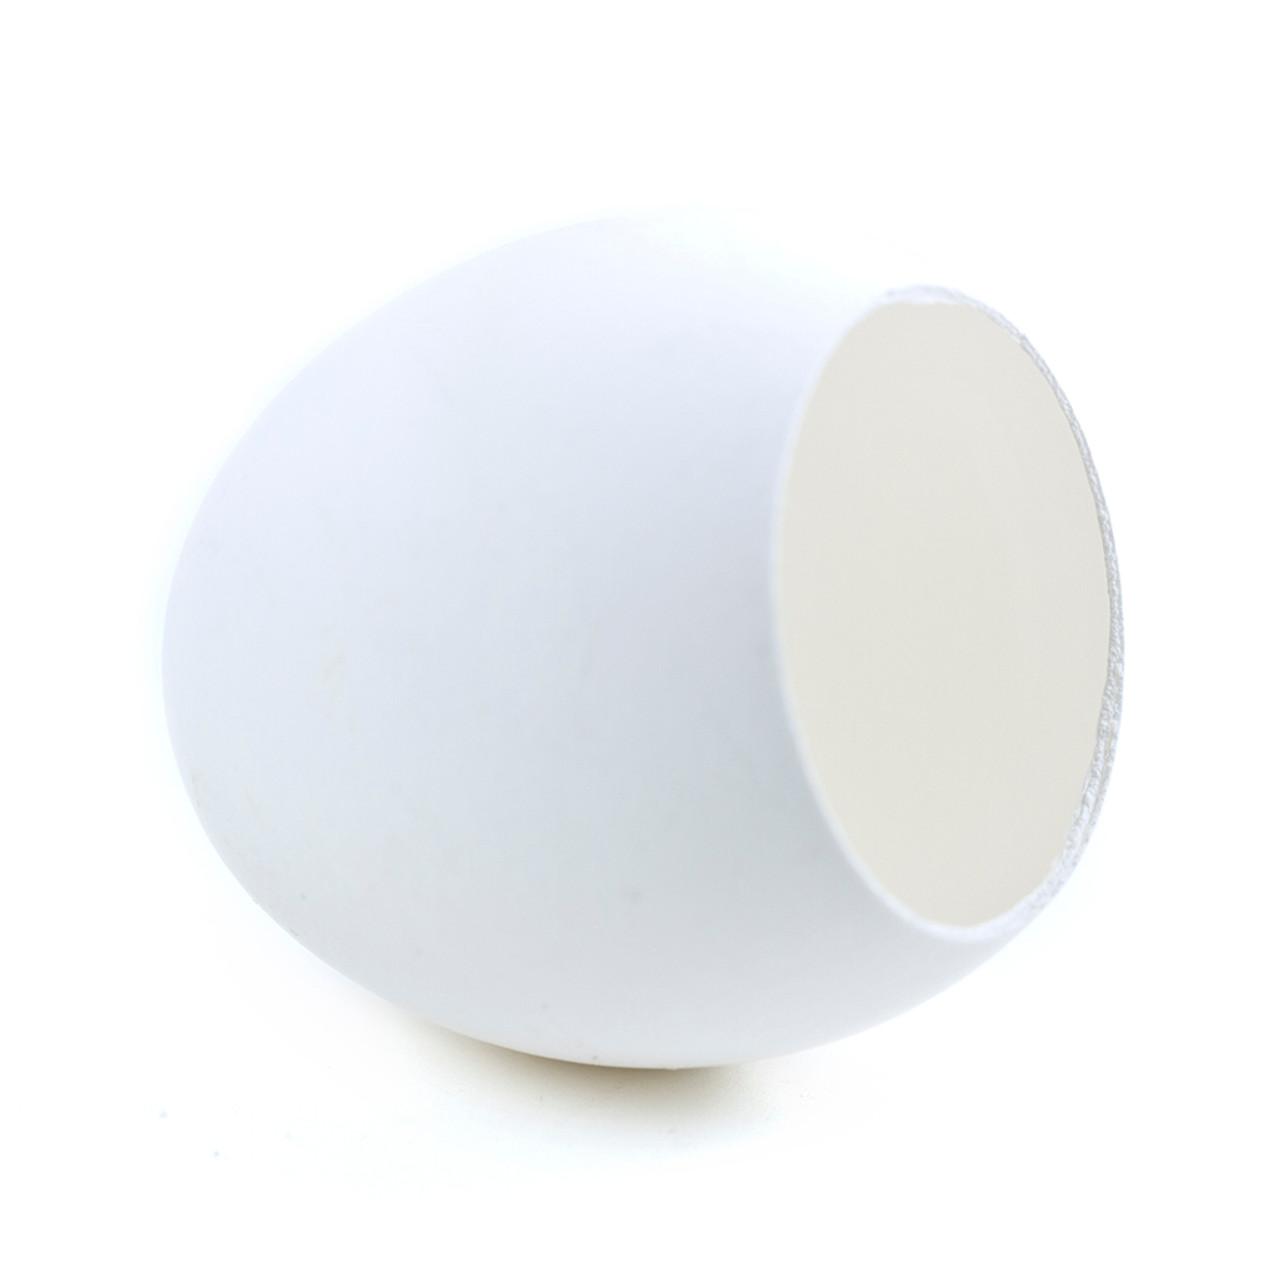 Egg Shell White x 6